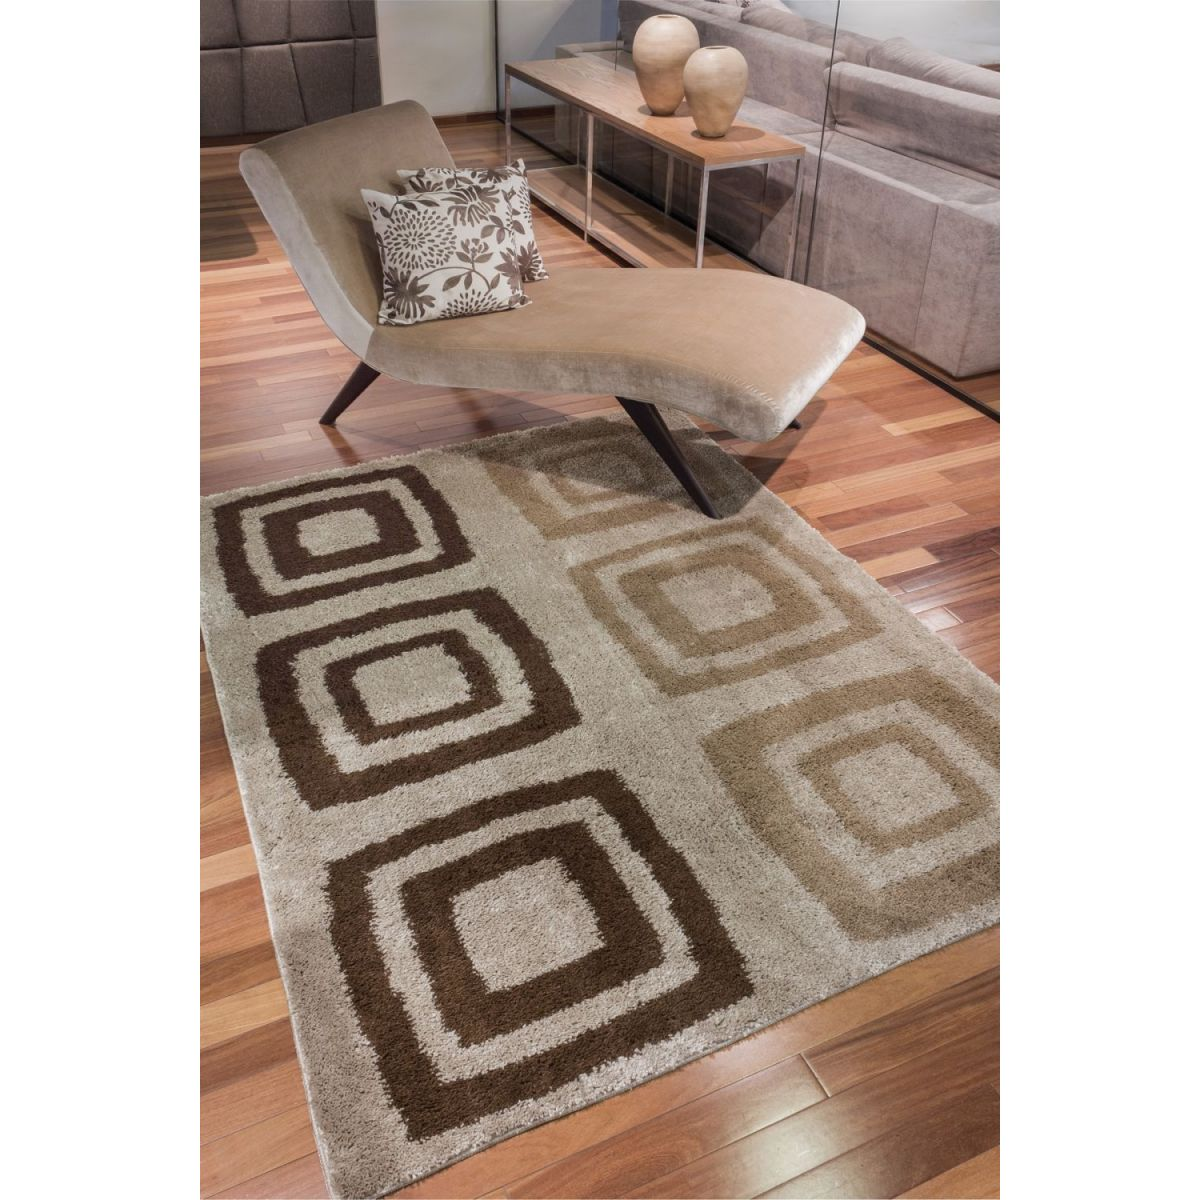 tapete de sala jolitex 1 50x1 00 pelo alto domo cubos. Black Bedroom Furniture Sets. Home Design Ideas